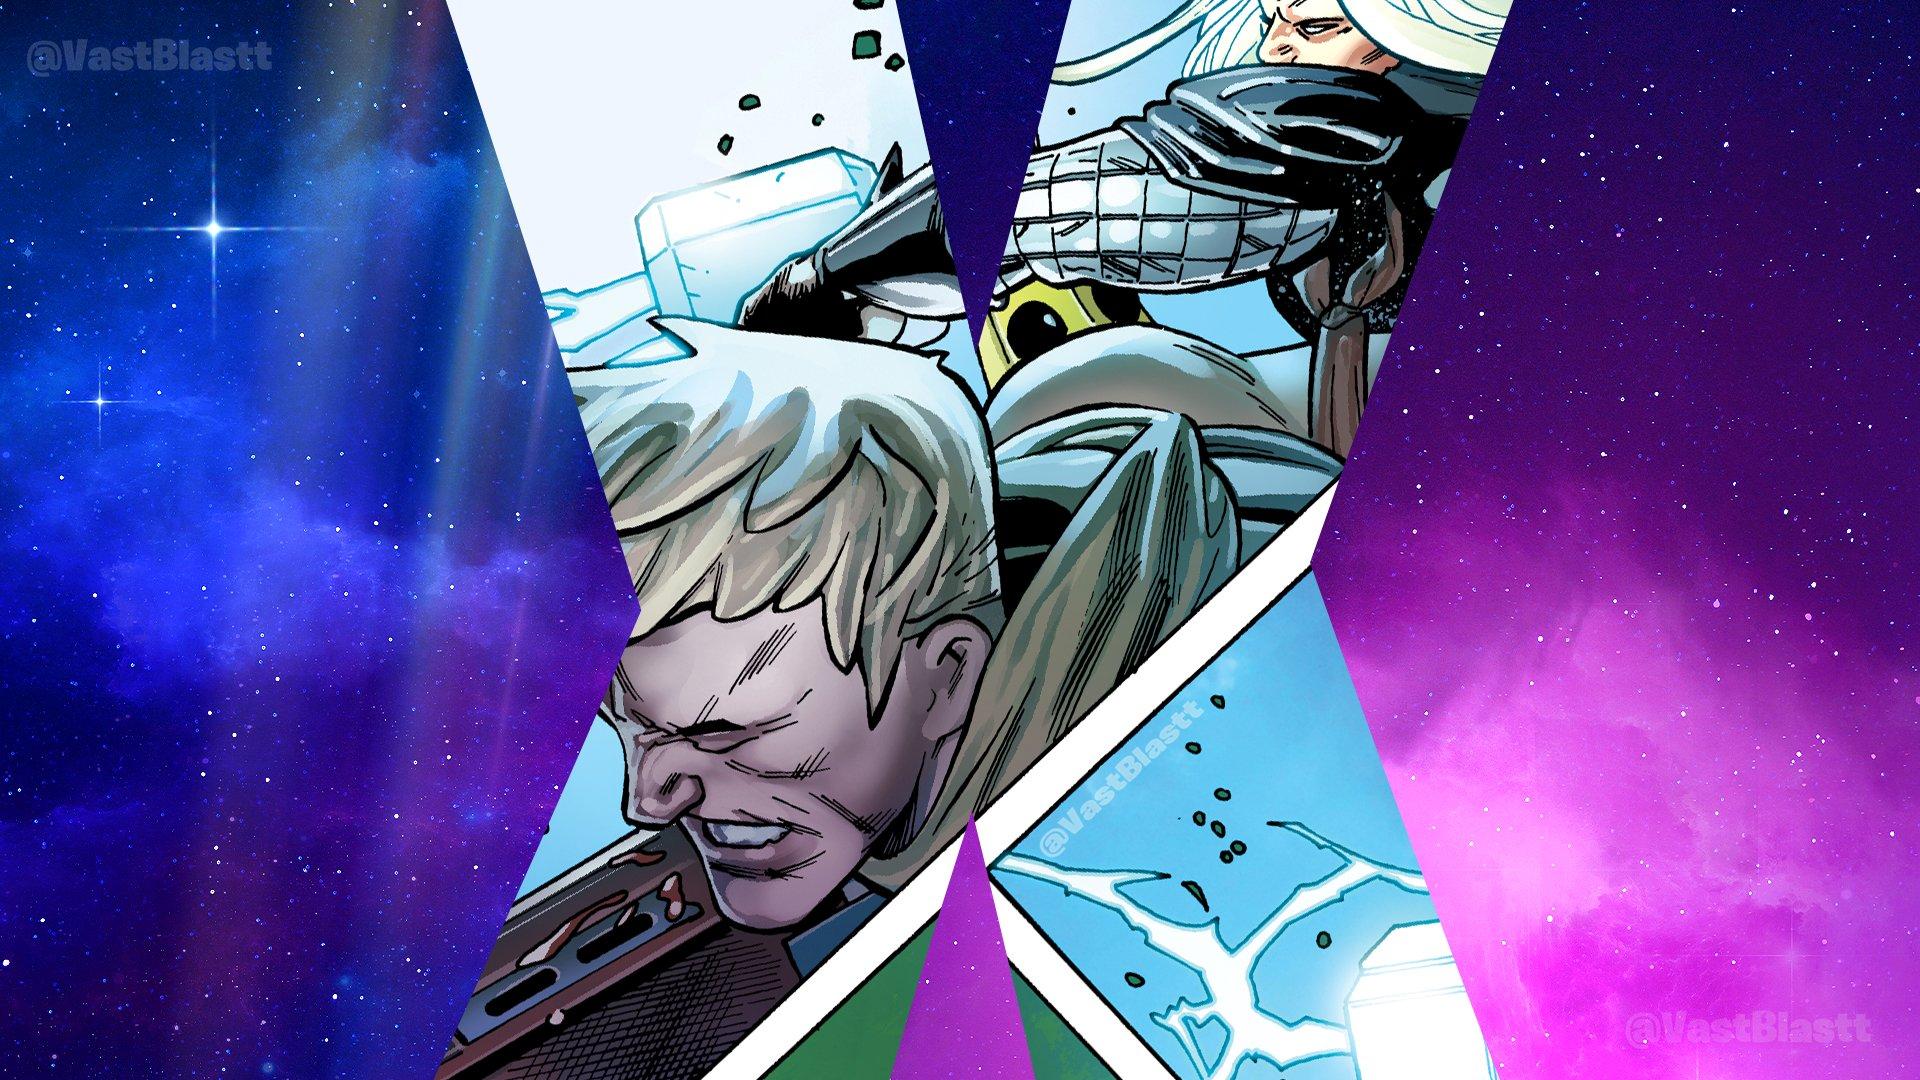 Evento Marvel Fortnite stagione 4